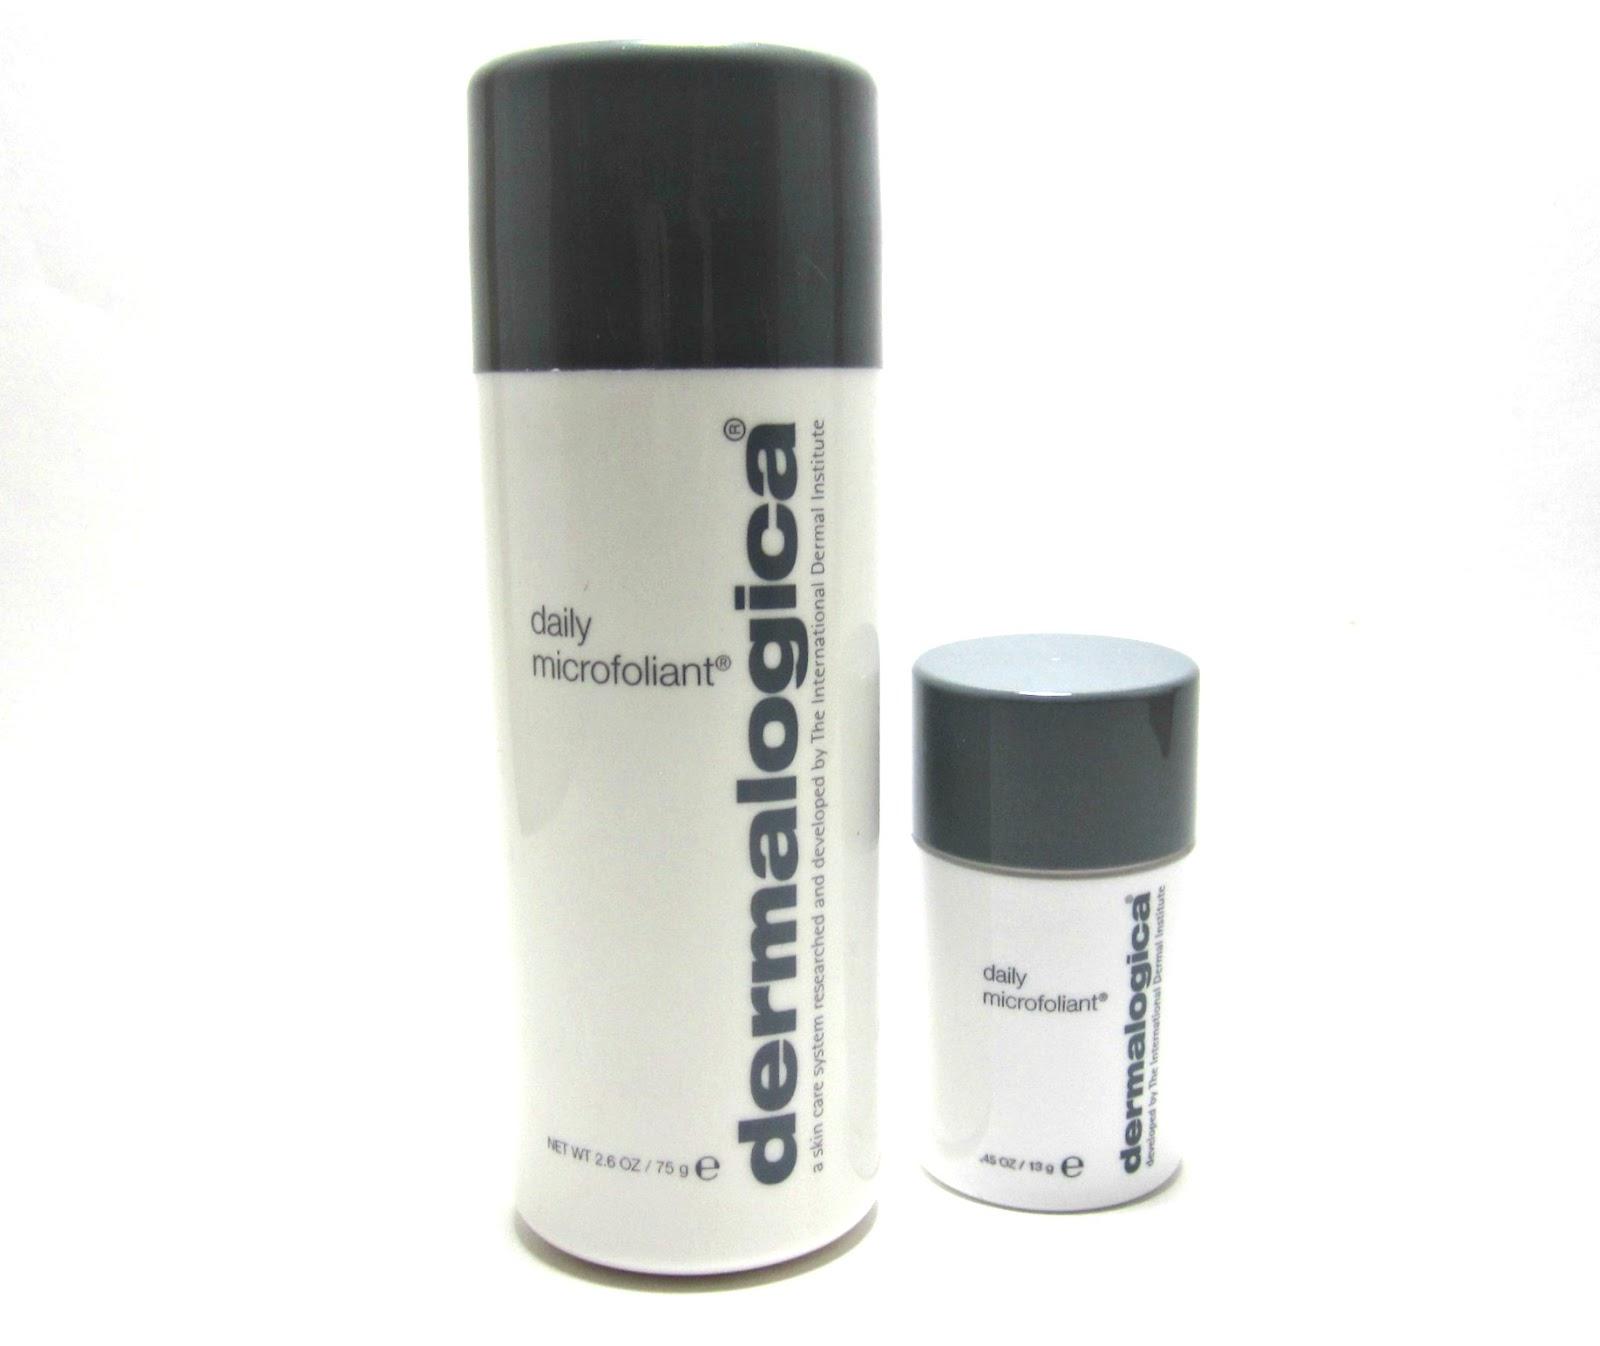 Dermalogica Daily Micro Exfoliant